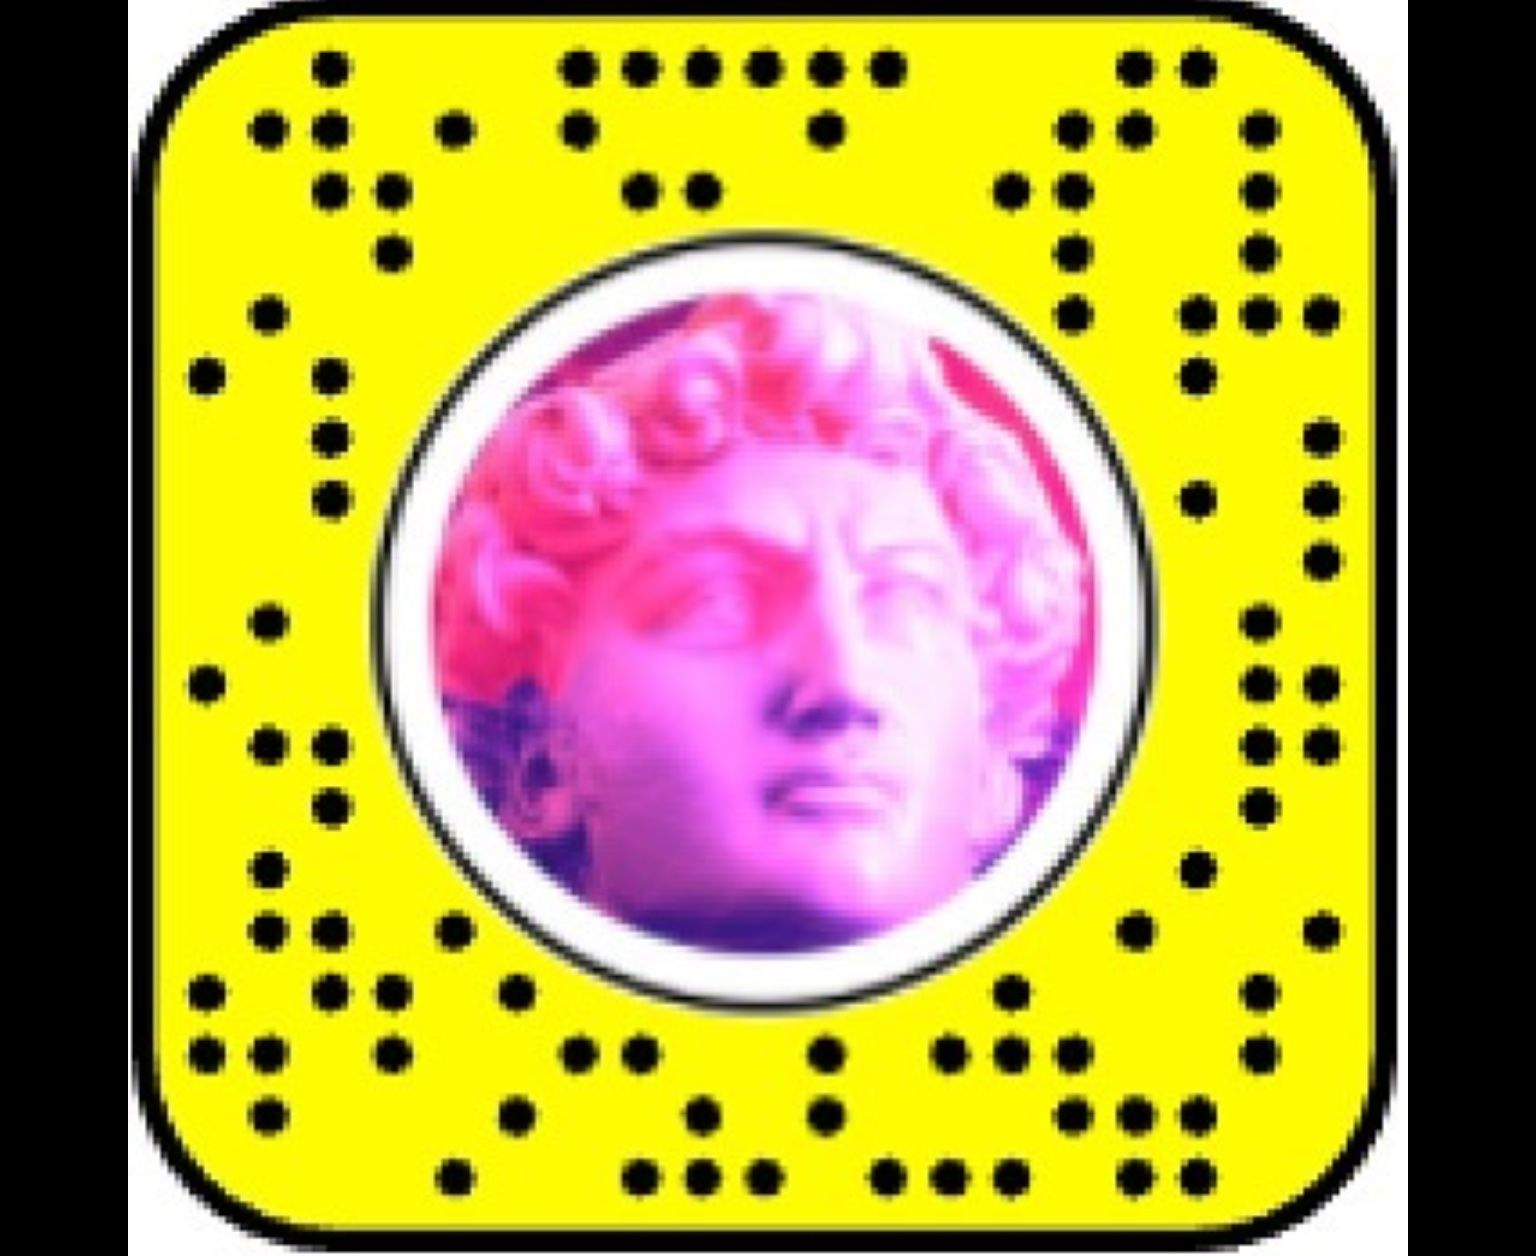 Snap lens image by b a d d i e s o n l y on s n a p l e n